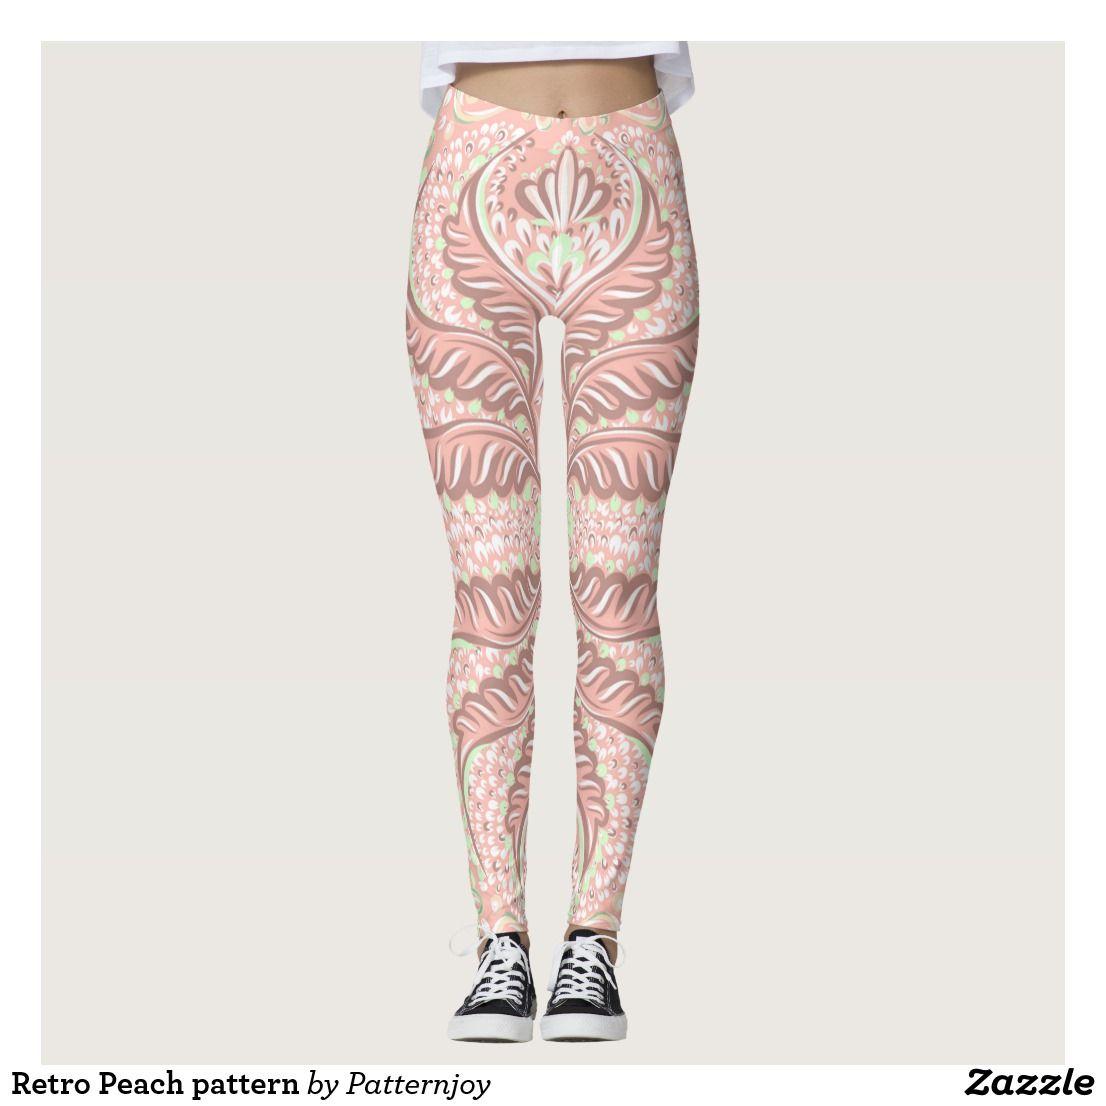 Retro Peach pattern Leggings   #abstract #retro #floral #pattern #vintage #inspired #cute #kawaii #Leggings